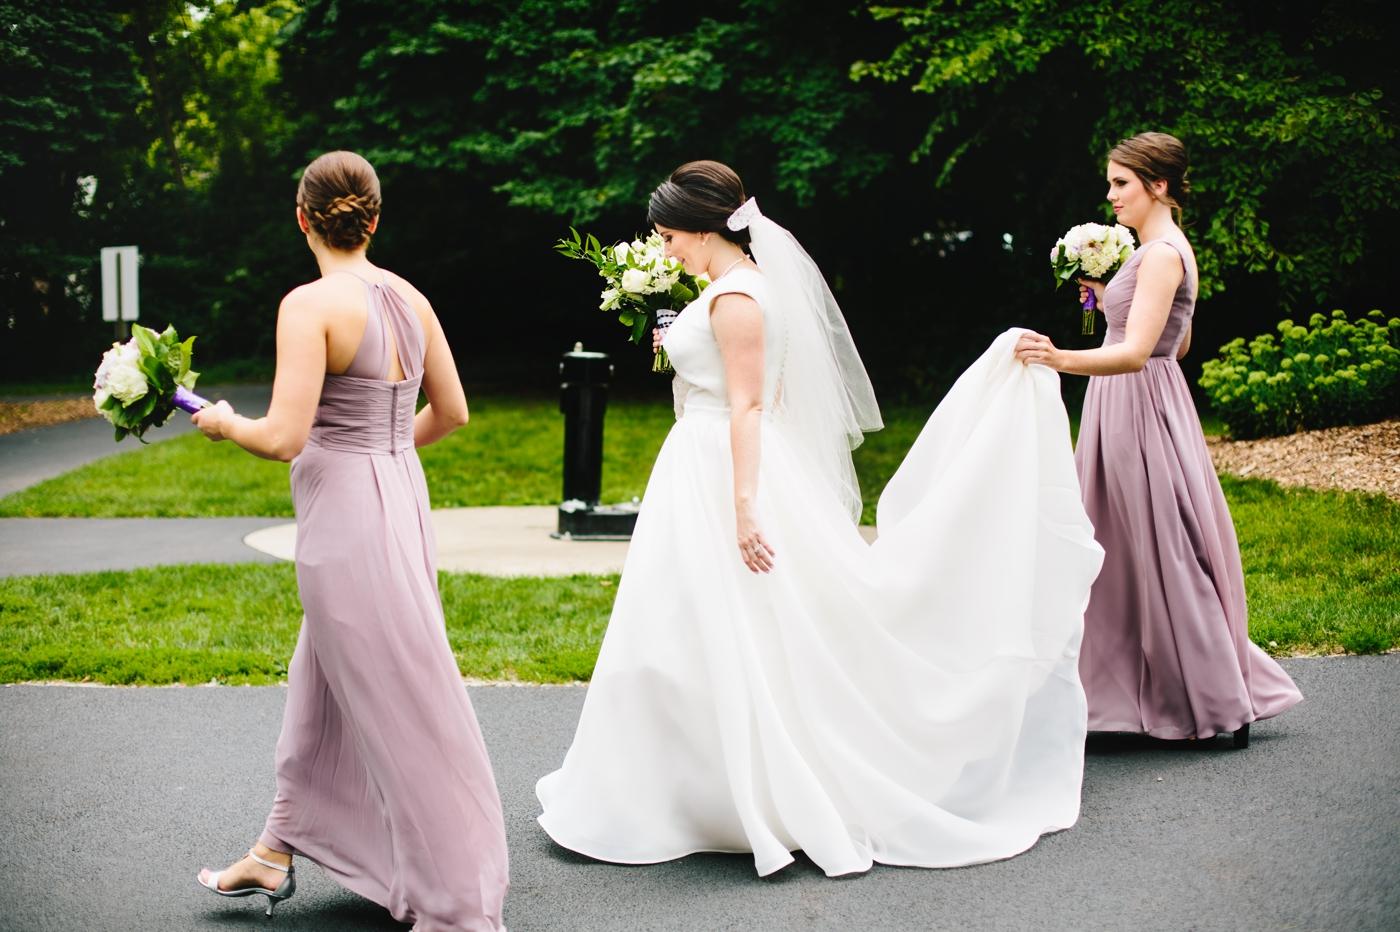 chicago-fine-art-wedding-photography-mccarthy37